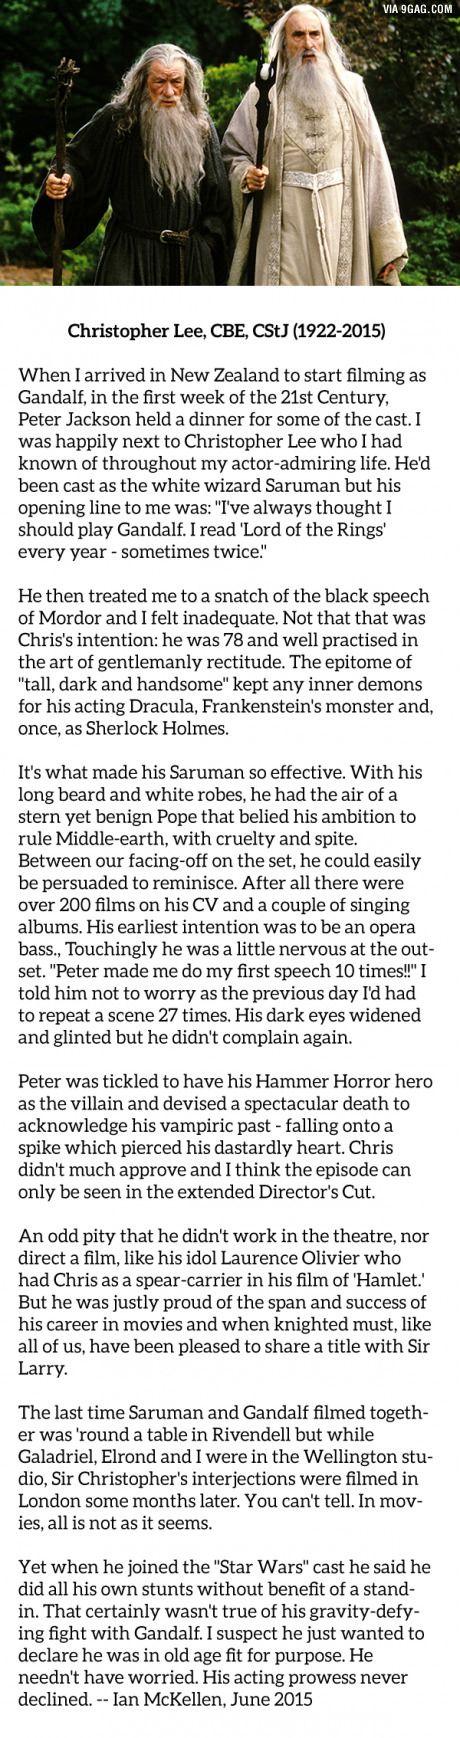 Sir Ian McKellen on Christopher Lee